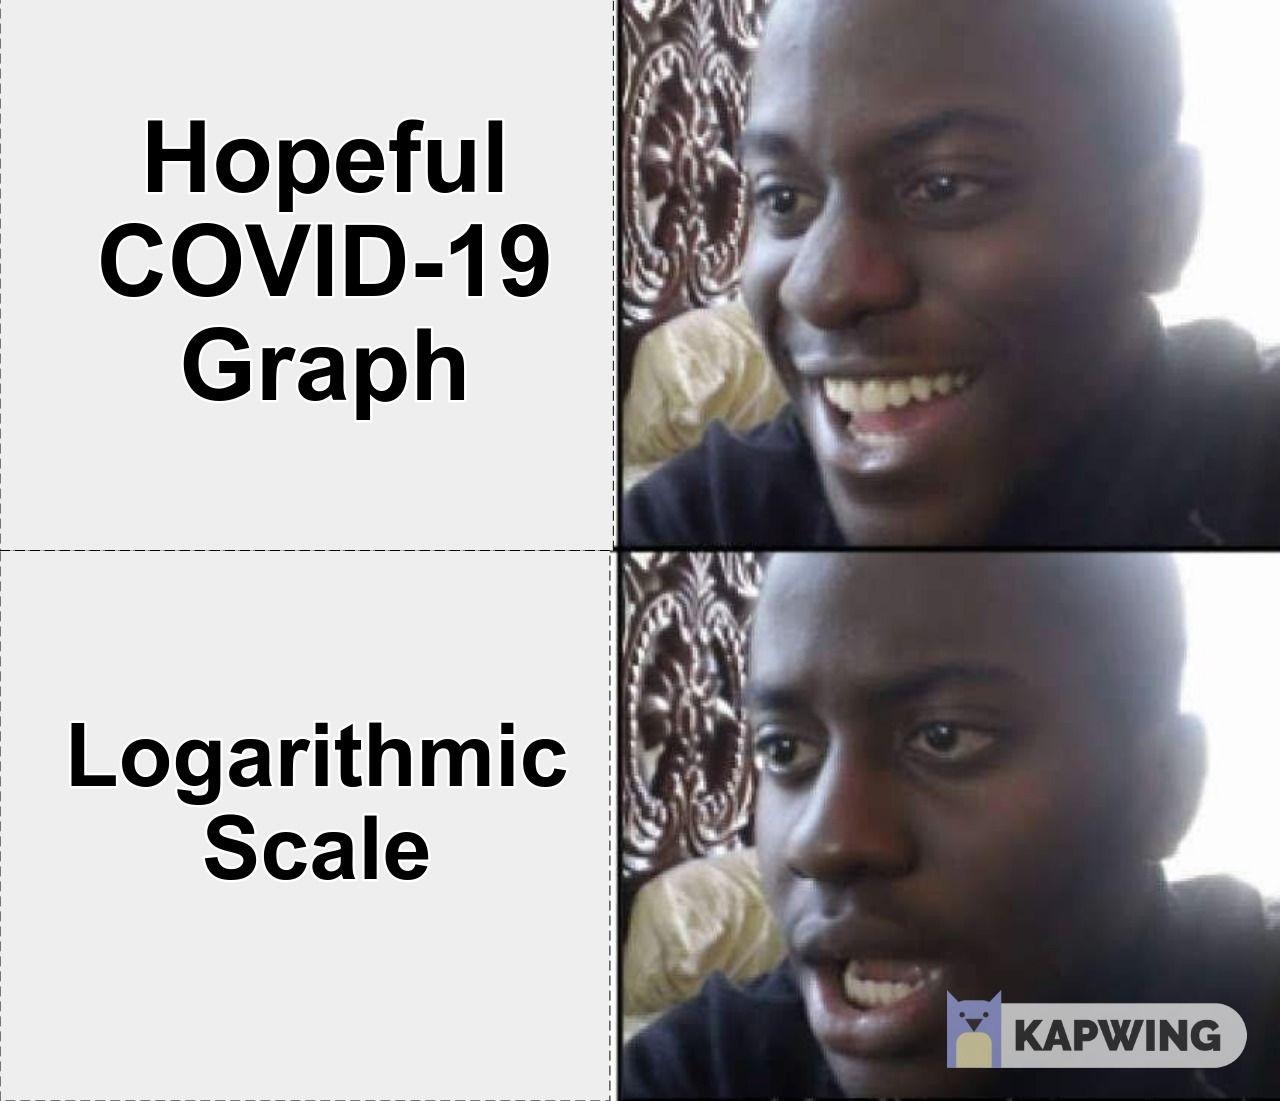 Pin on /r/CoronavirusMemes